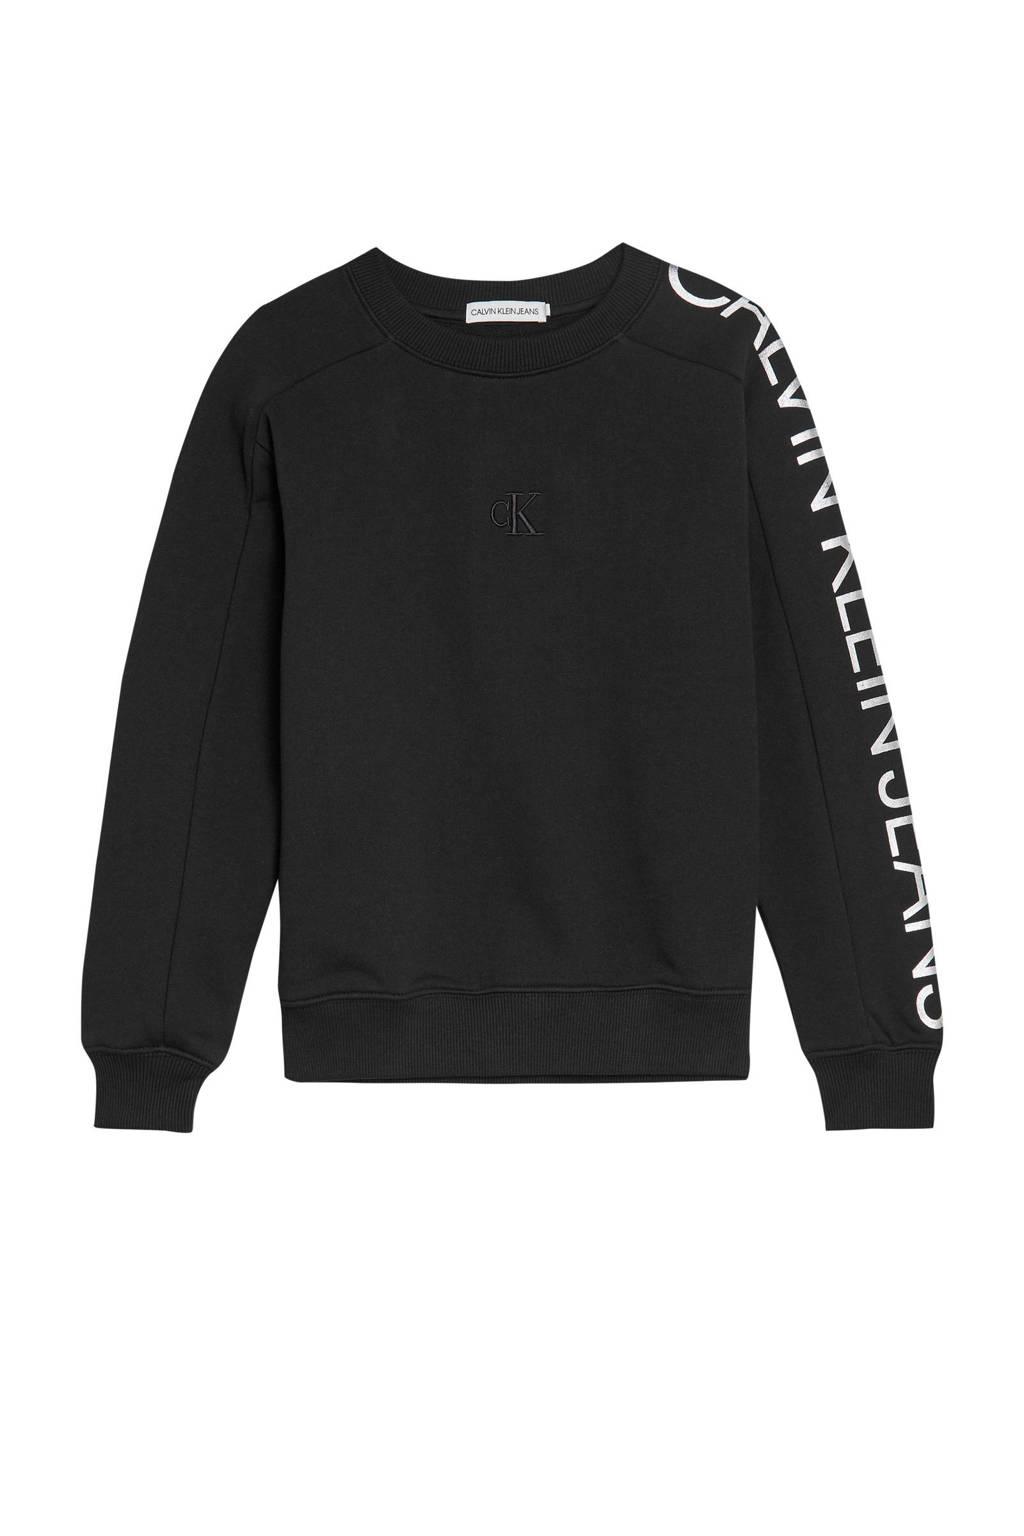 CALVIN KLEIN JEANS sweater met logo en borduursels zwart, Zwart